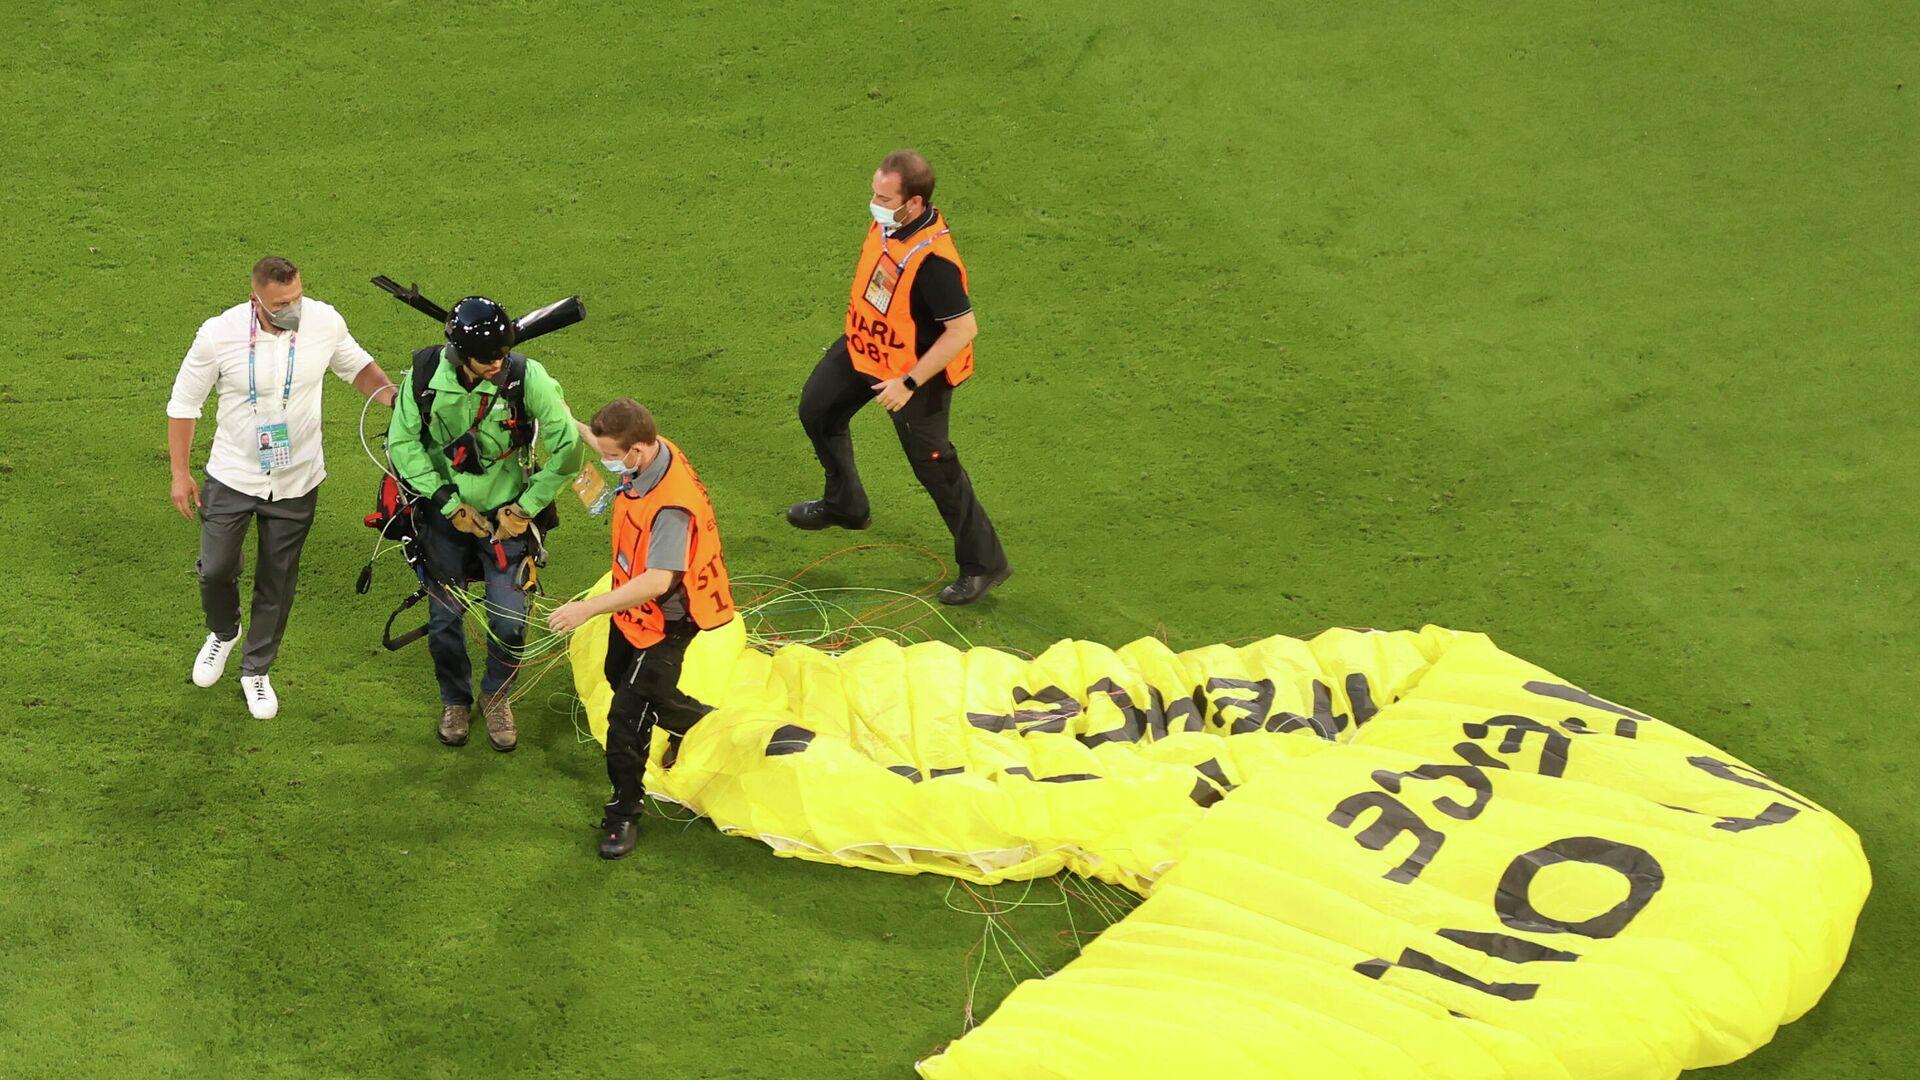 Парапланерист приземлился на поле перед началом матча ЕВРО-2020 Франция - Германия - РИА Новости, 1920, 15.06.2021